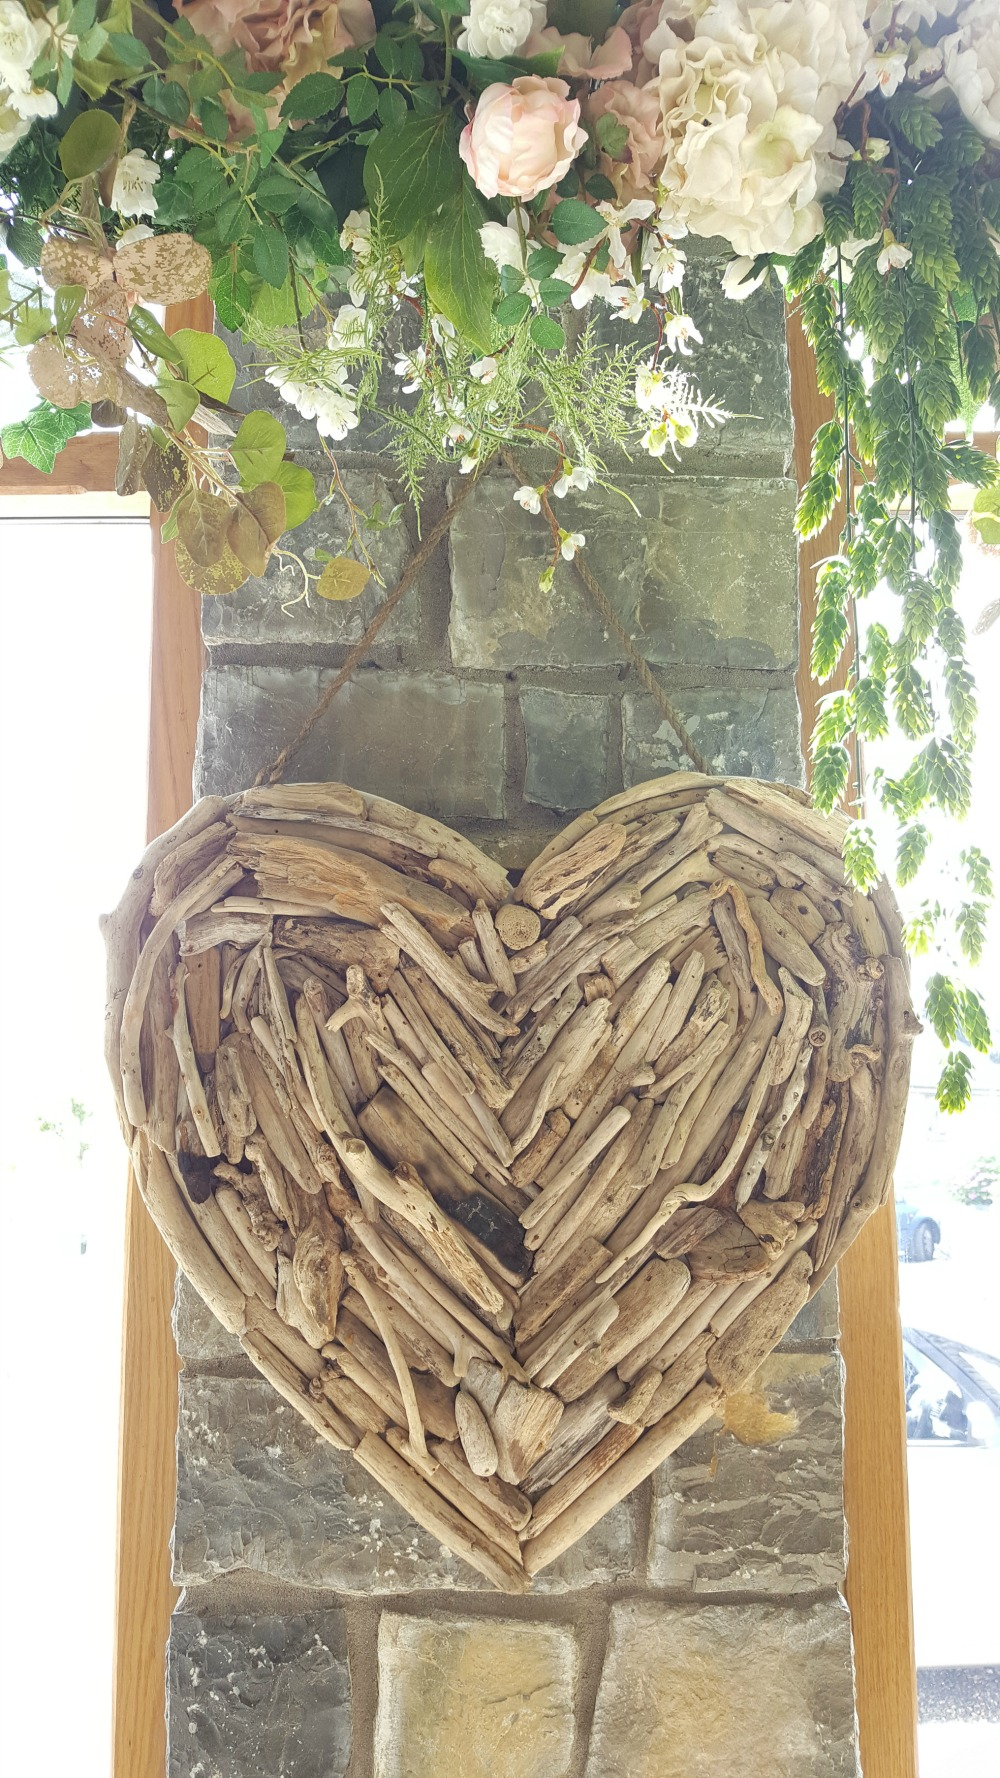 Large Driftwood Heart - £12